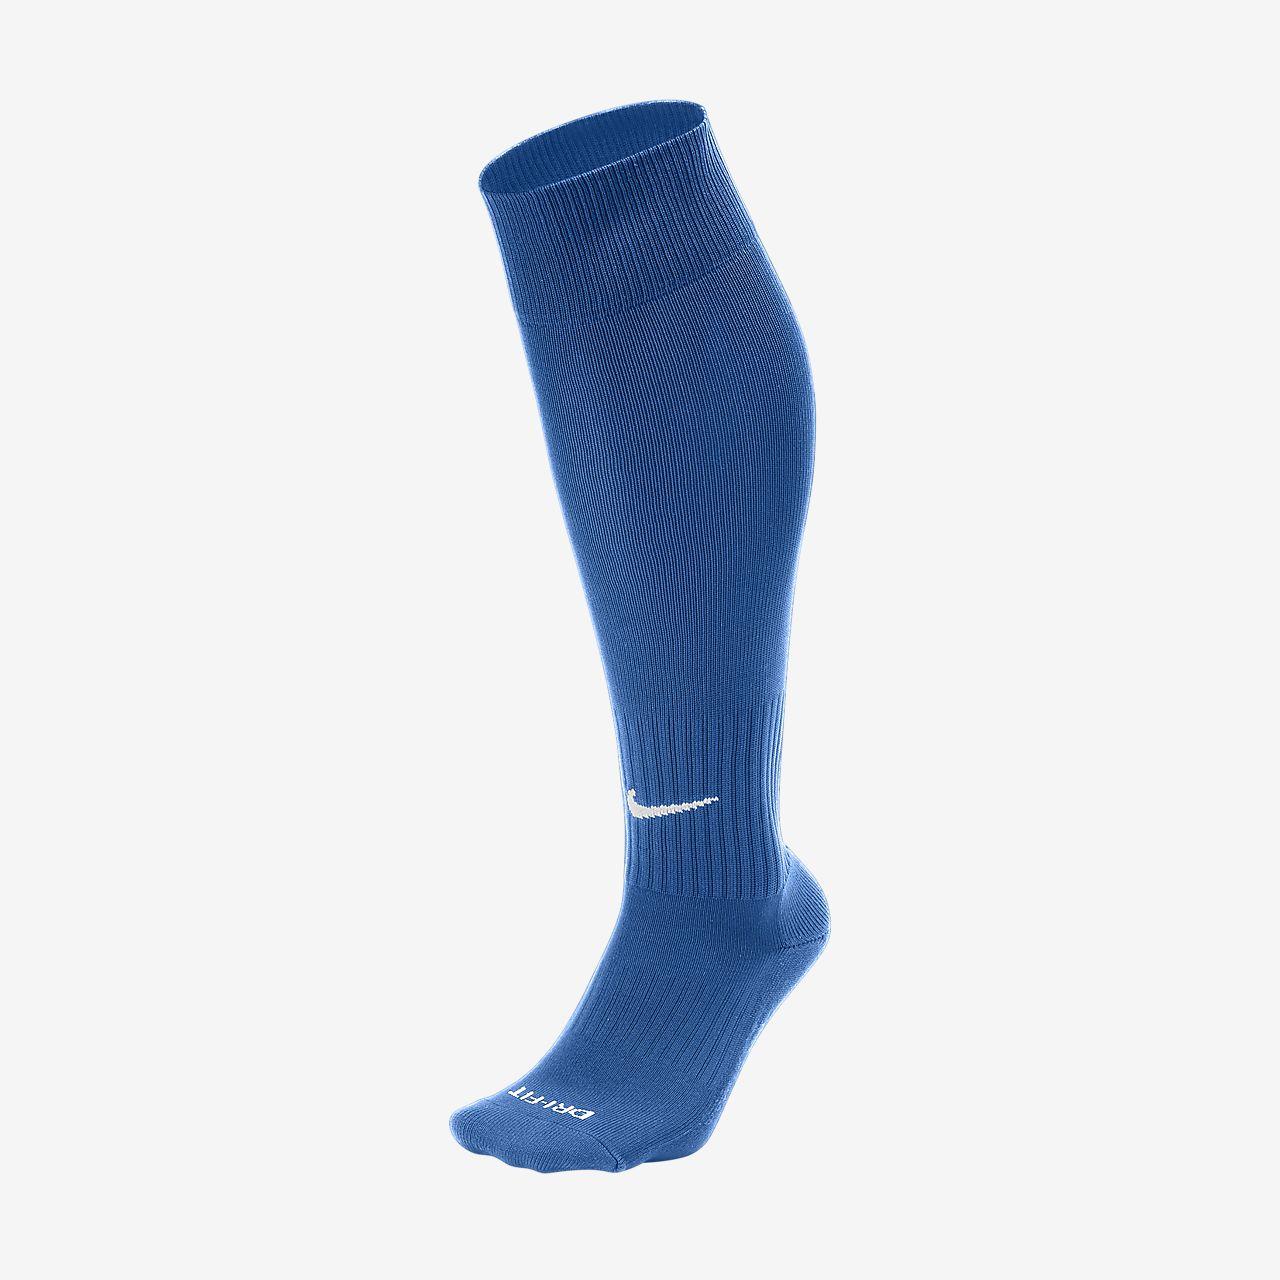 Nike Classic 2 Over-the-Calf sokken met demping